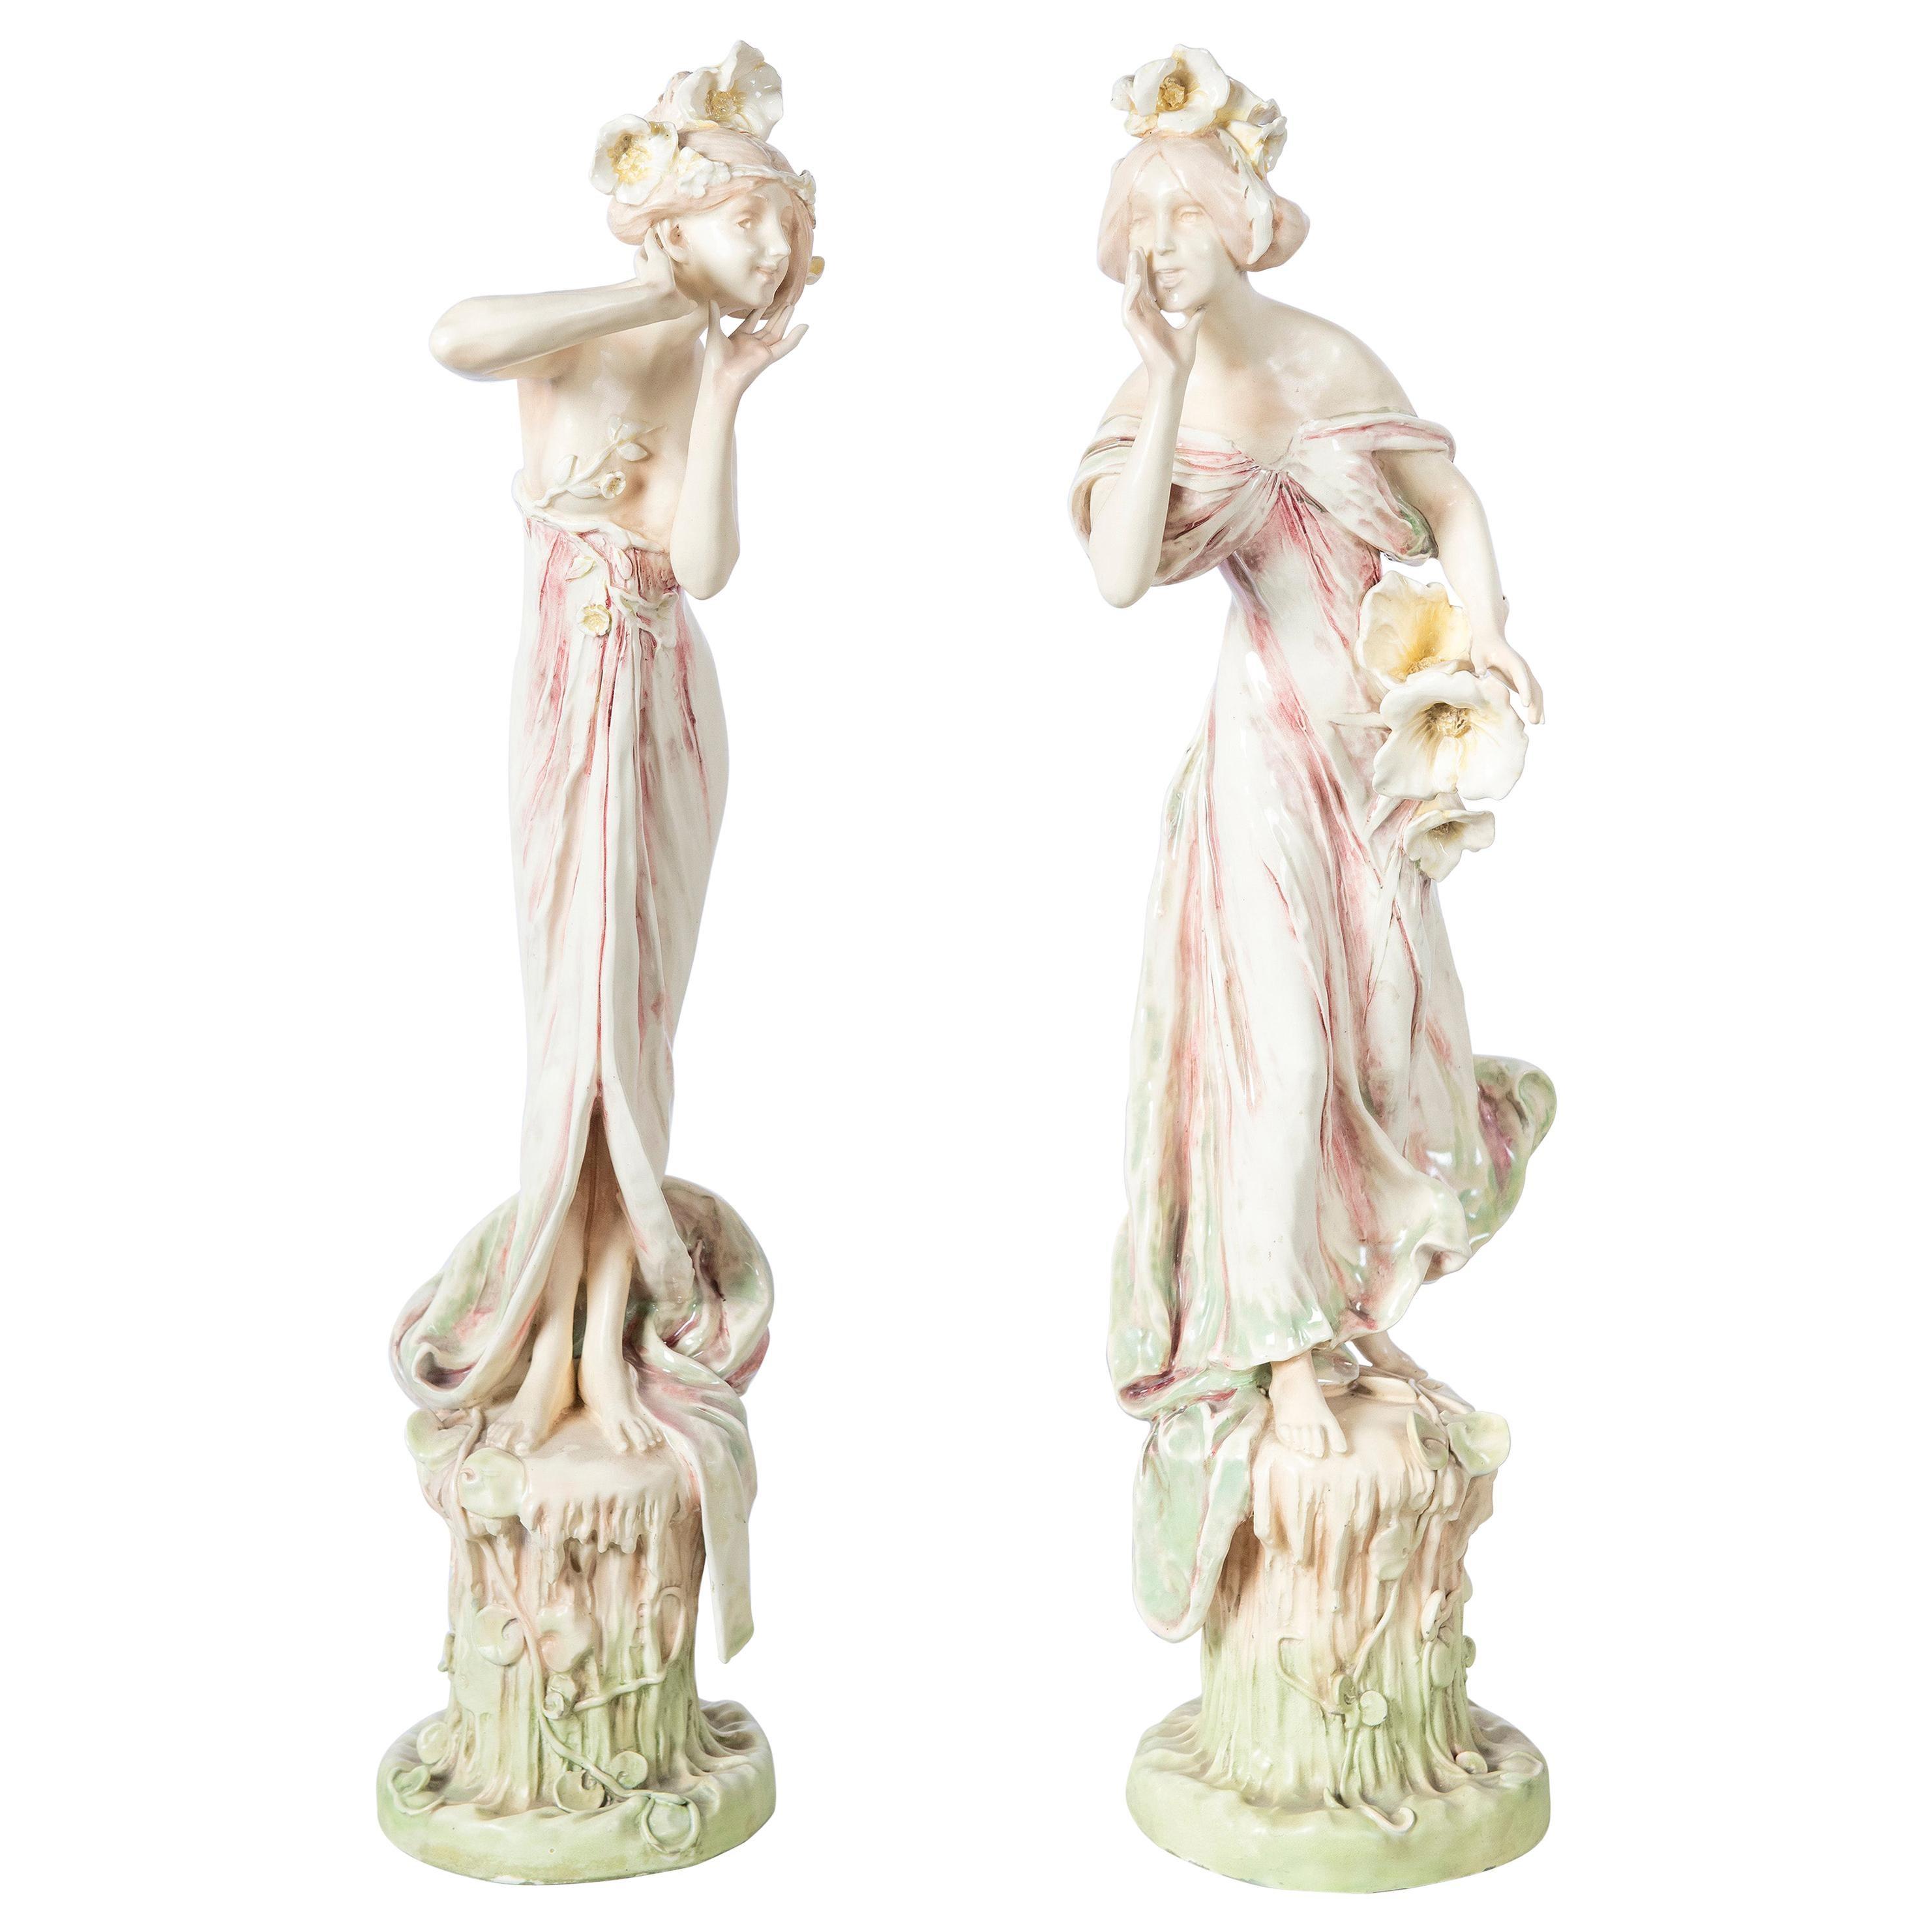 Pair of Glazed Ceramic Woman, Art Nouveau Period, Vienna, circa 1900